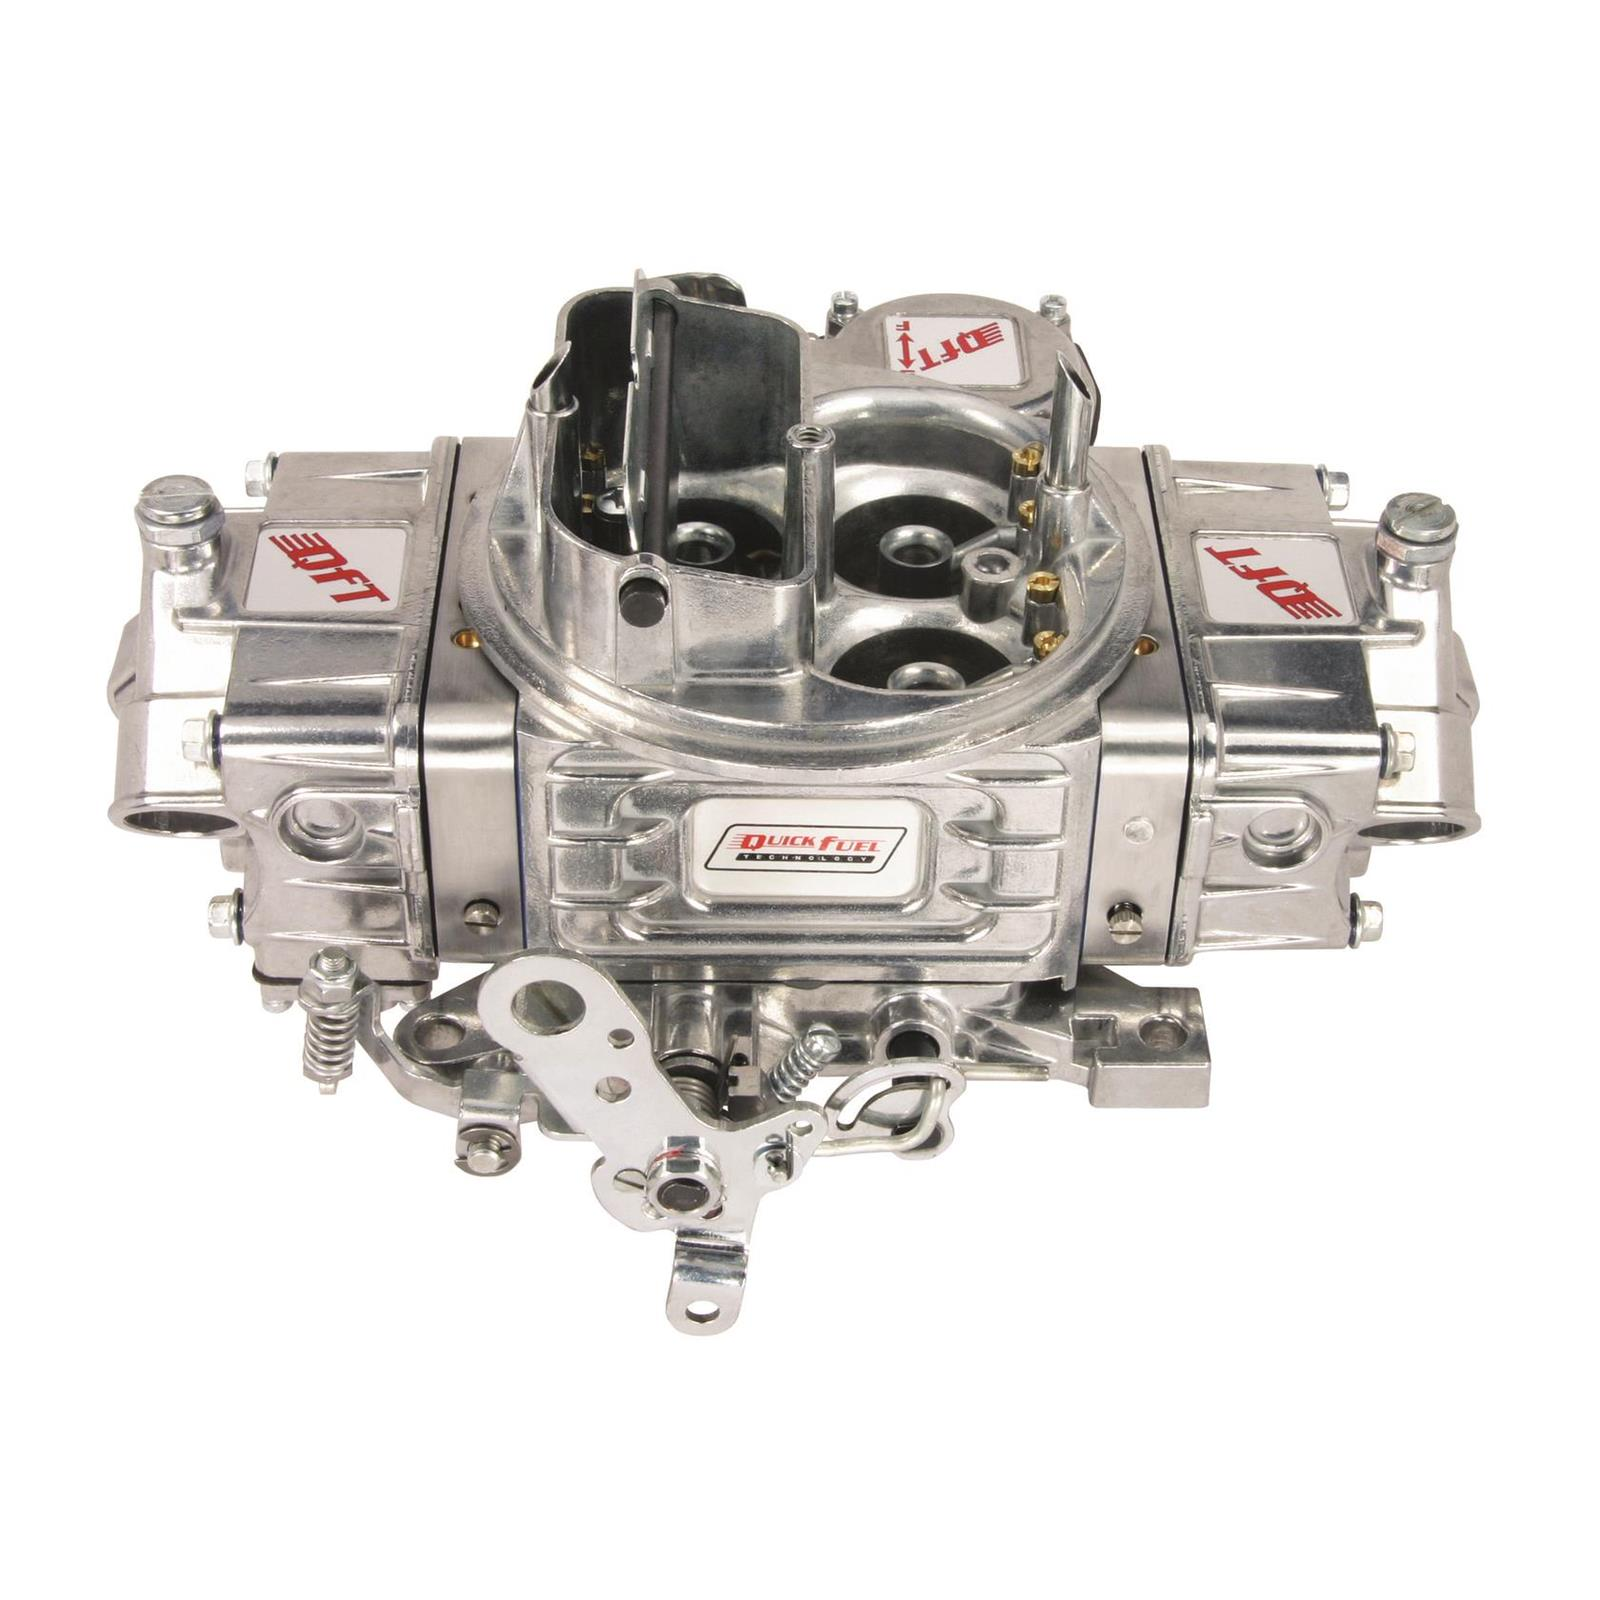 IMTB19151-60A-BA Mount Kit for Honda Civic//CRX D Series Engine Innovative Mounts